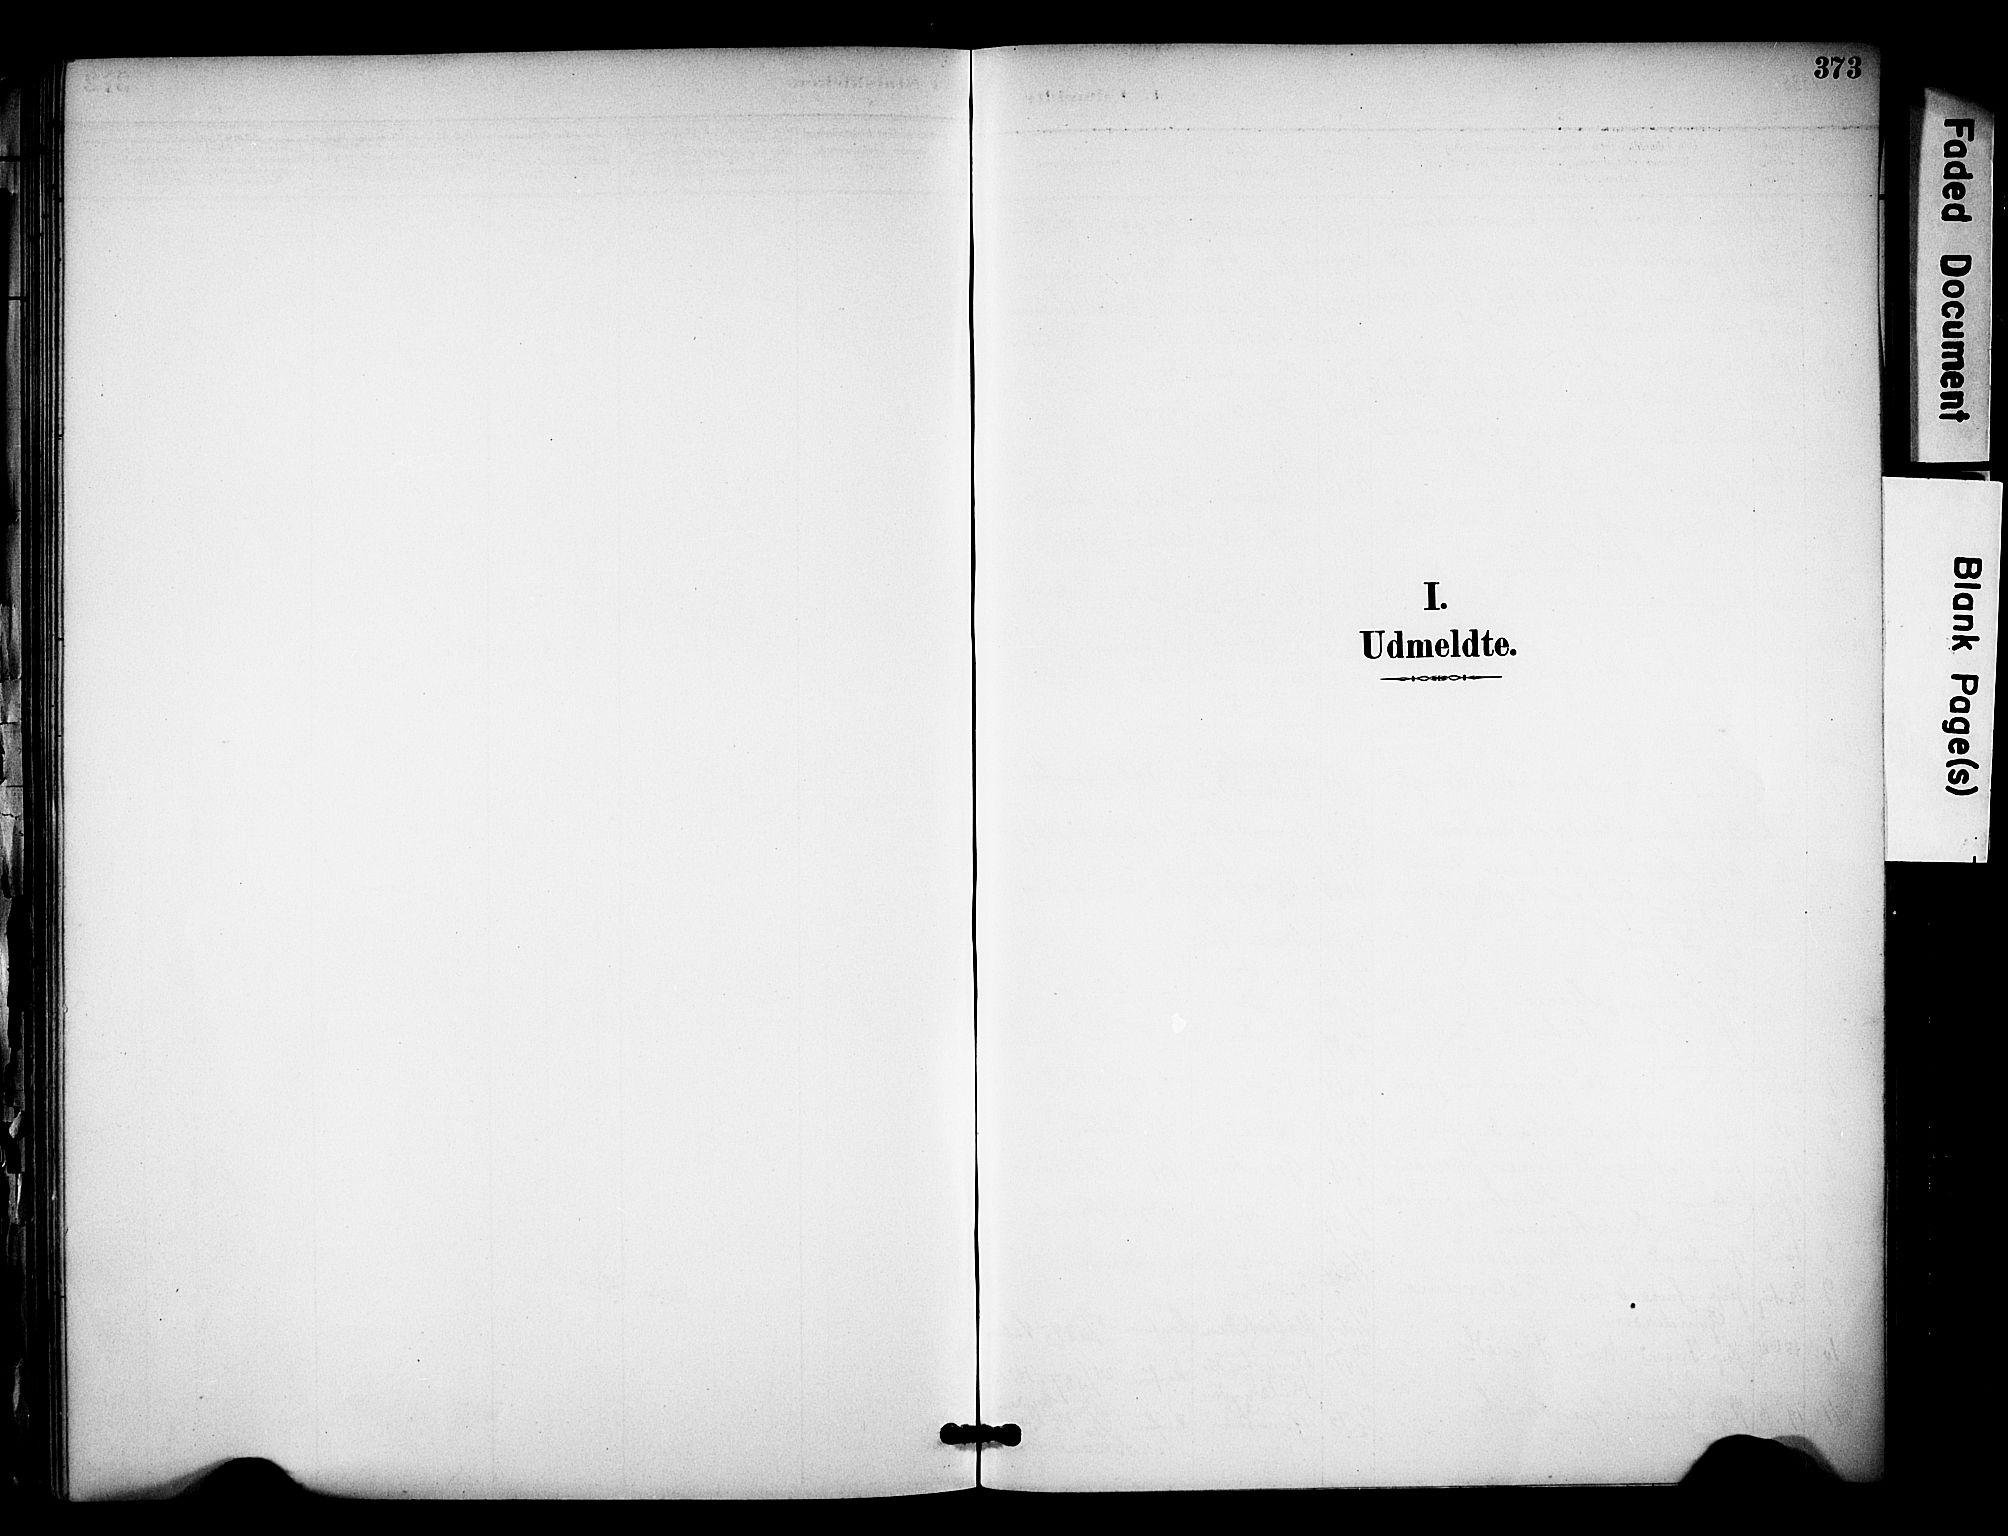 SAKO, Solum kirkebøker, F/Fa/L0010: Ministerialbok nr. I 10, 1888-1898, s. 373